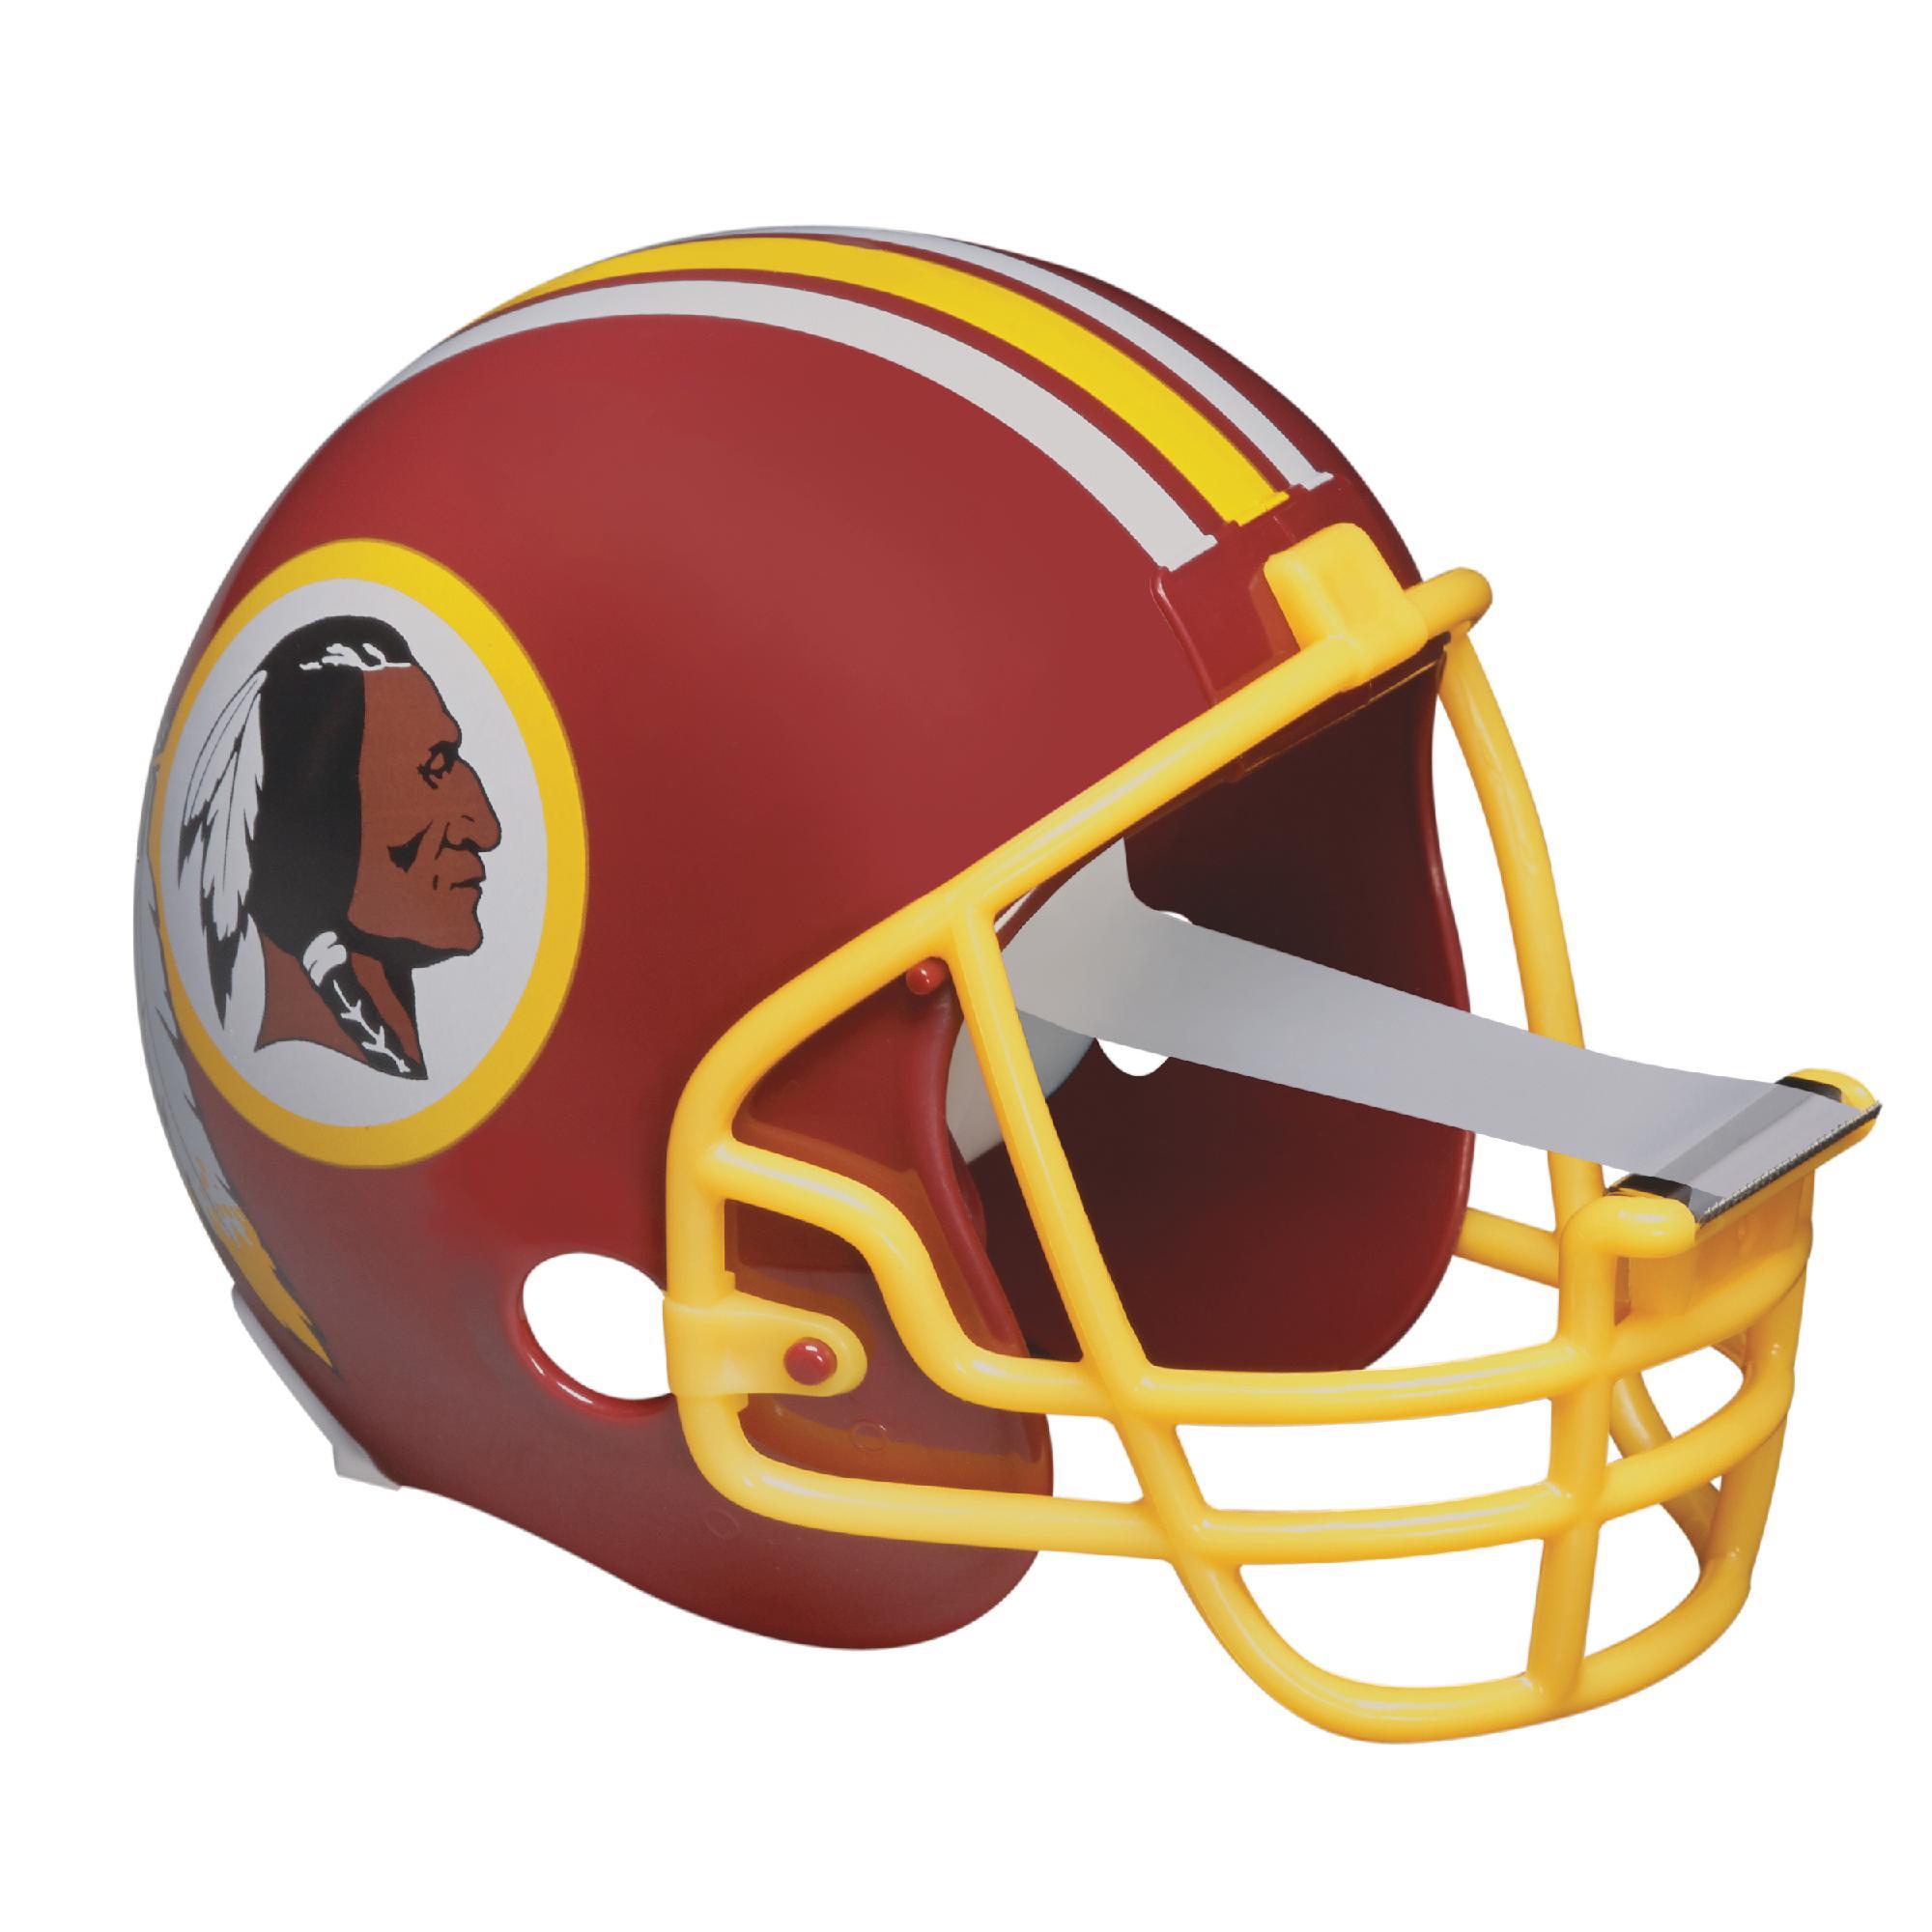 School Specialty, In Scotch NFL Washington Redskins Helmet Tape Dispenser PartNumber: 00679566000P